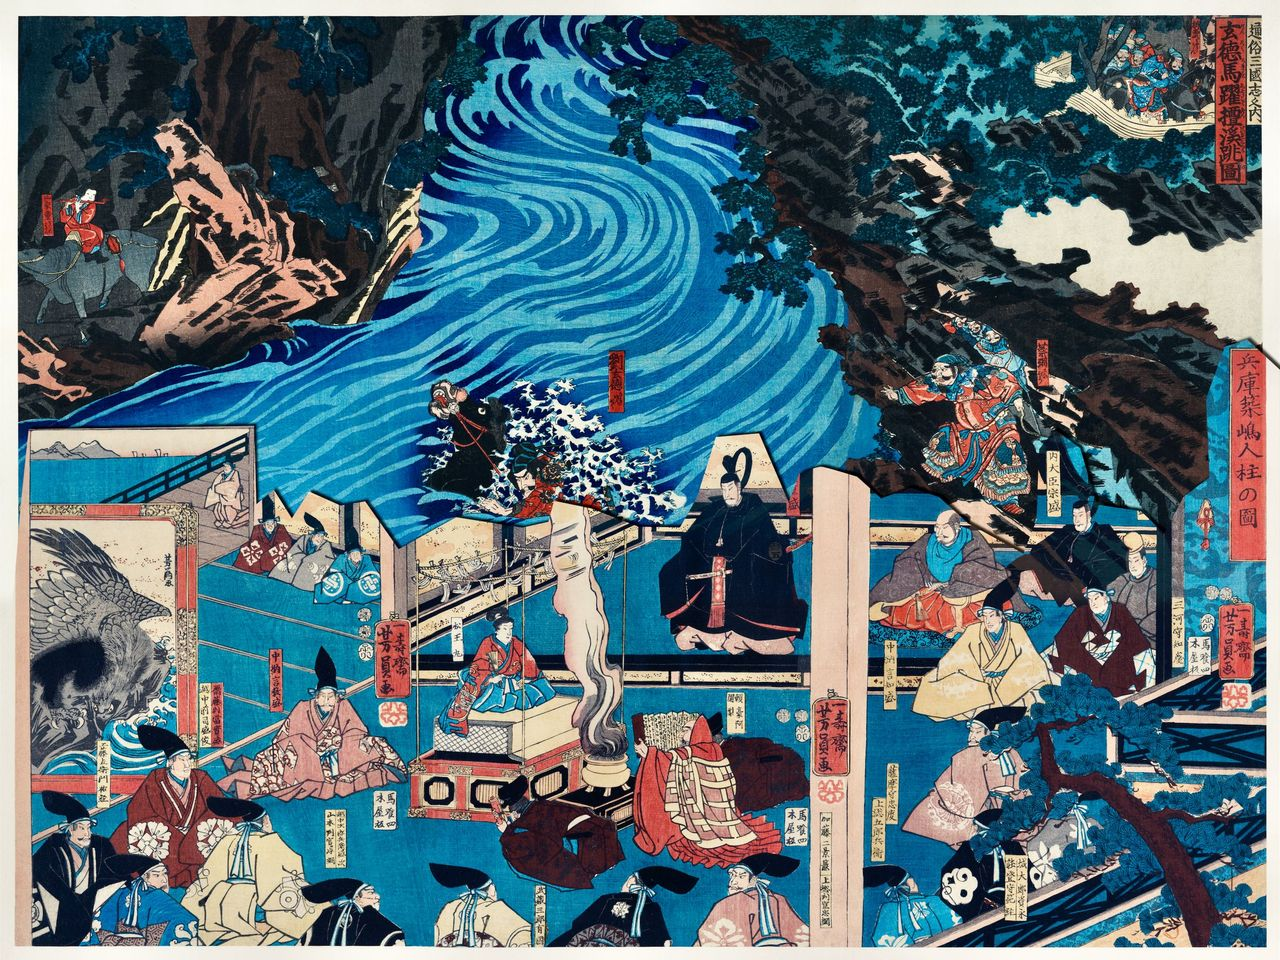 ukiyo-e-collage-style-1 (5).png